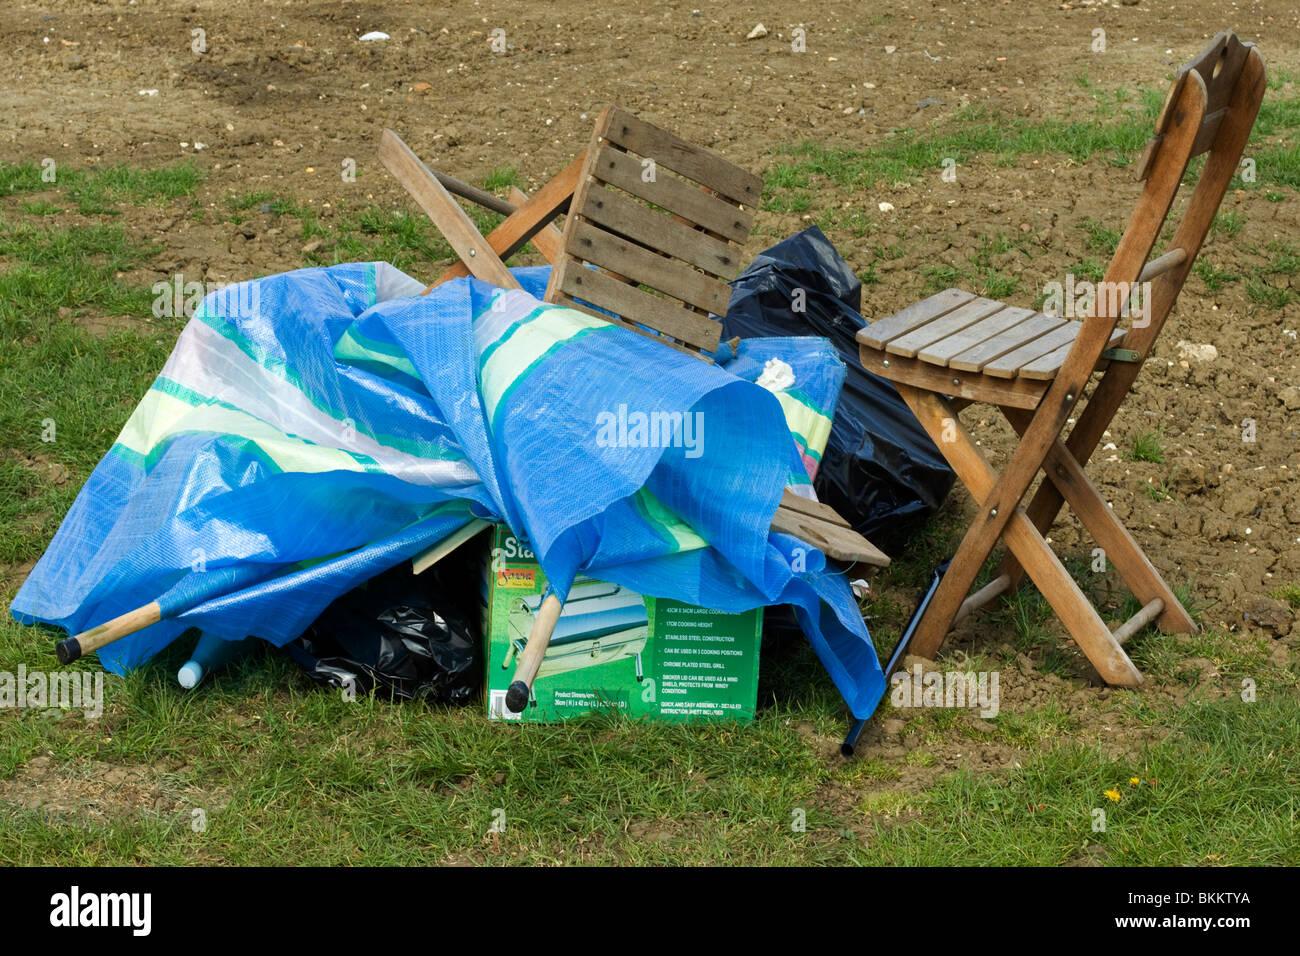 Rubbish left over on a campsite Big Bang Bus Show Santa Pod Raceway England Uk - Stock Image